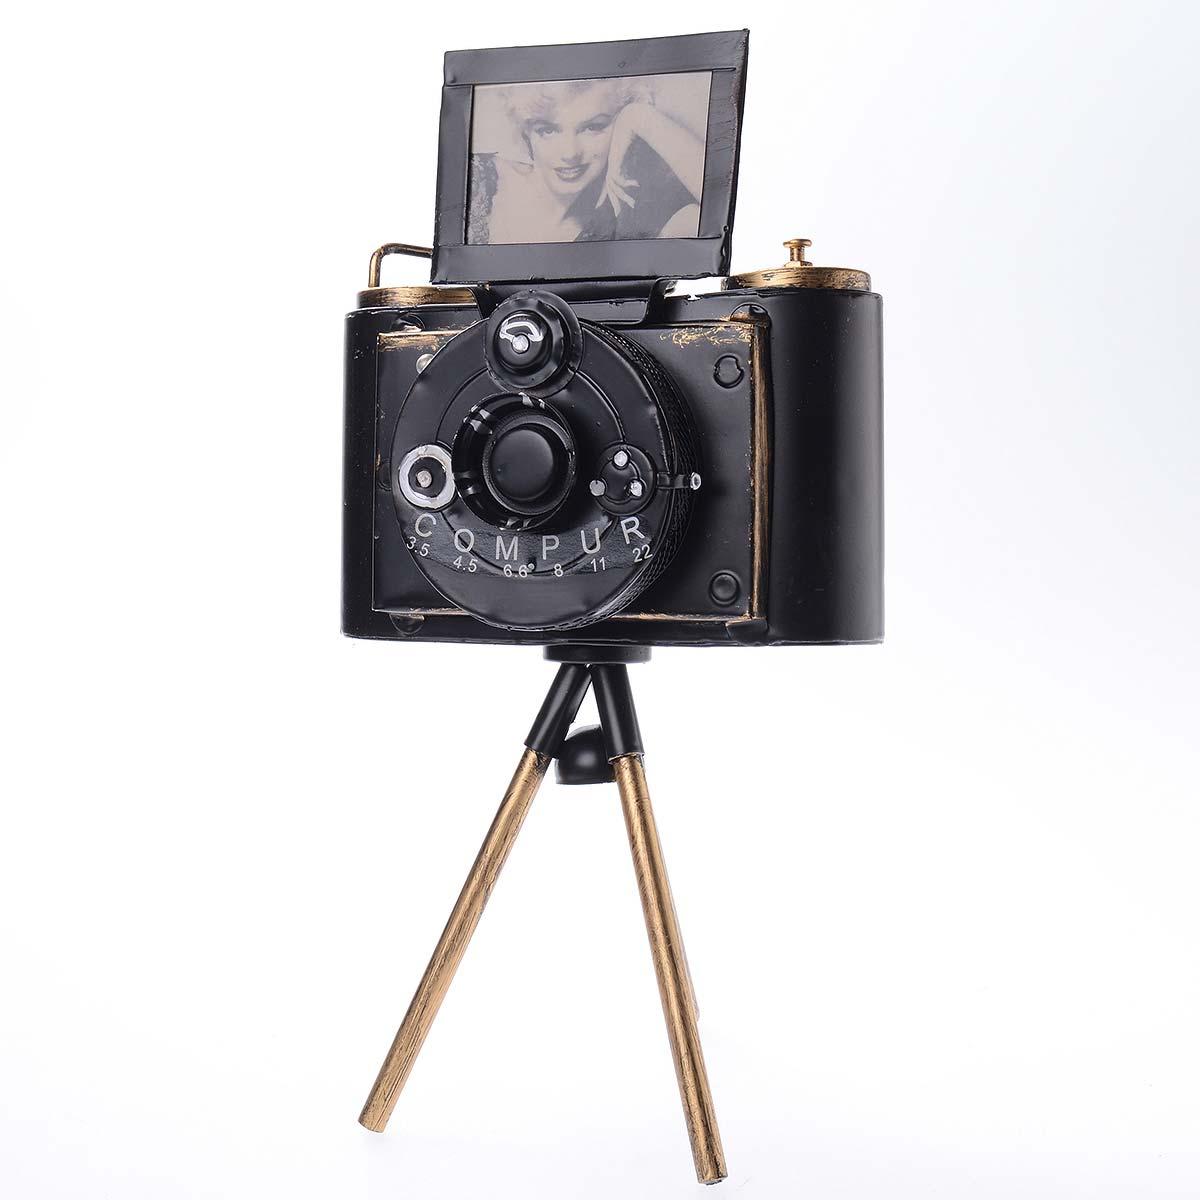 Vintage χειροποίητη διακοσμητική κάμερα μεταλλική με τρίποδο - ΟΕΜ 51557